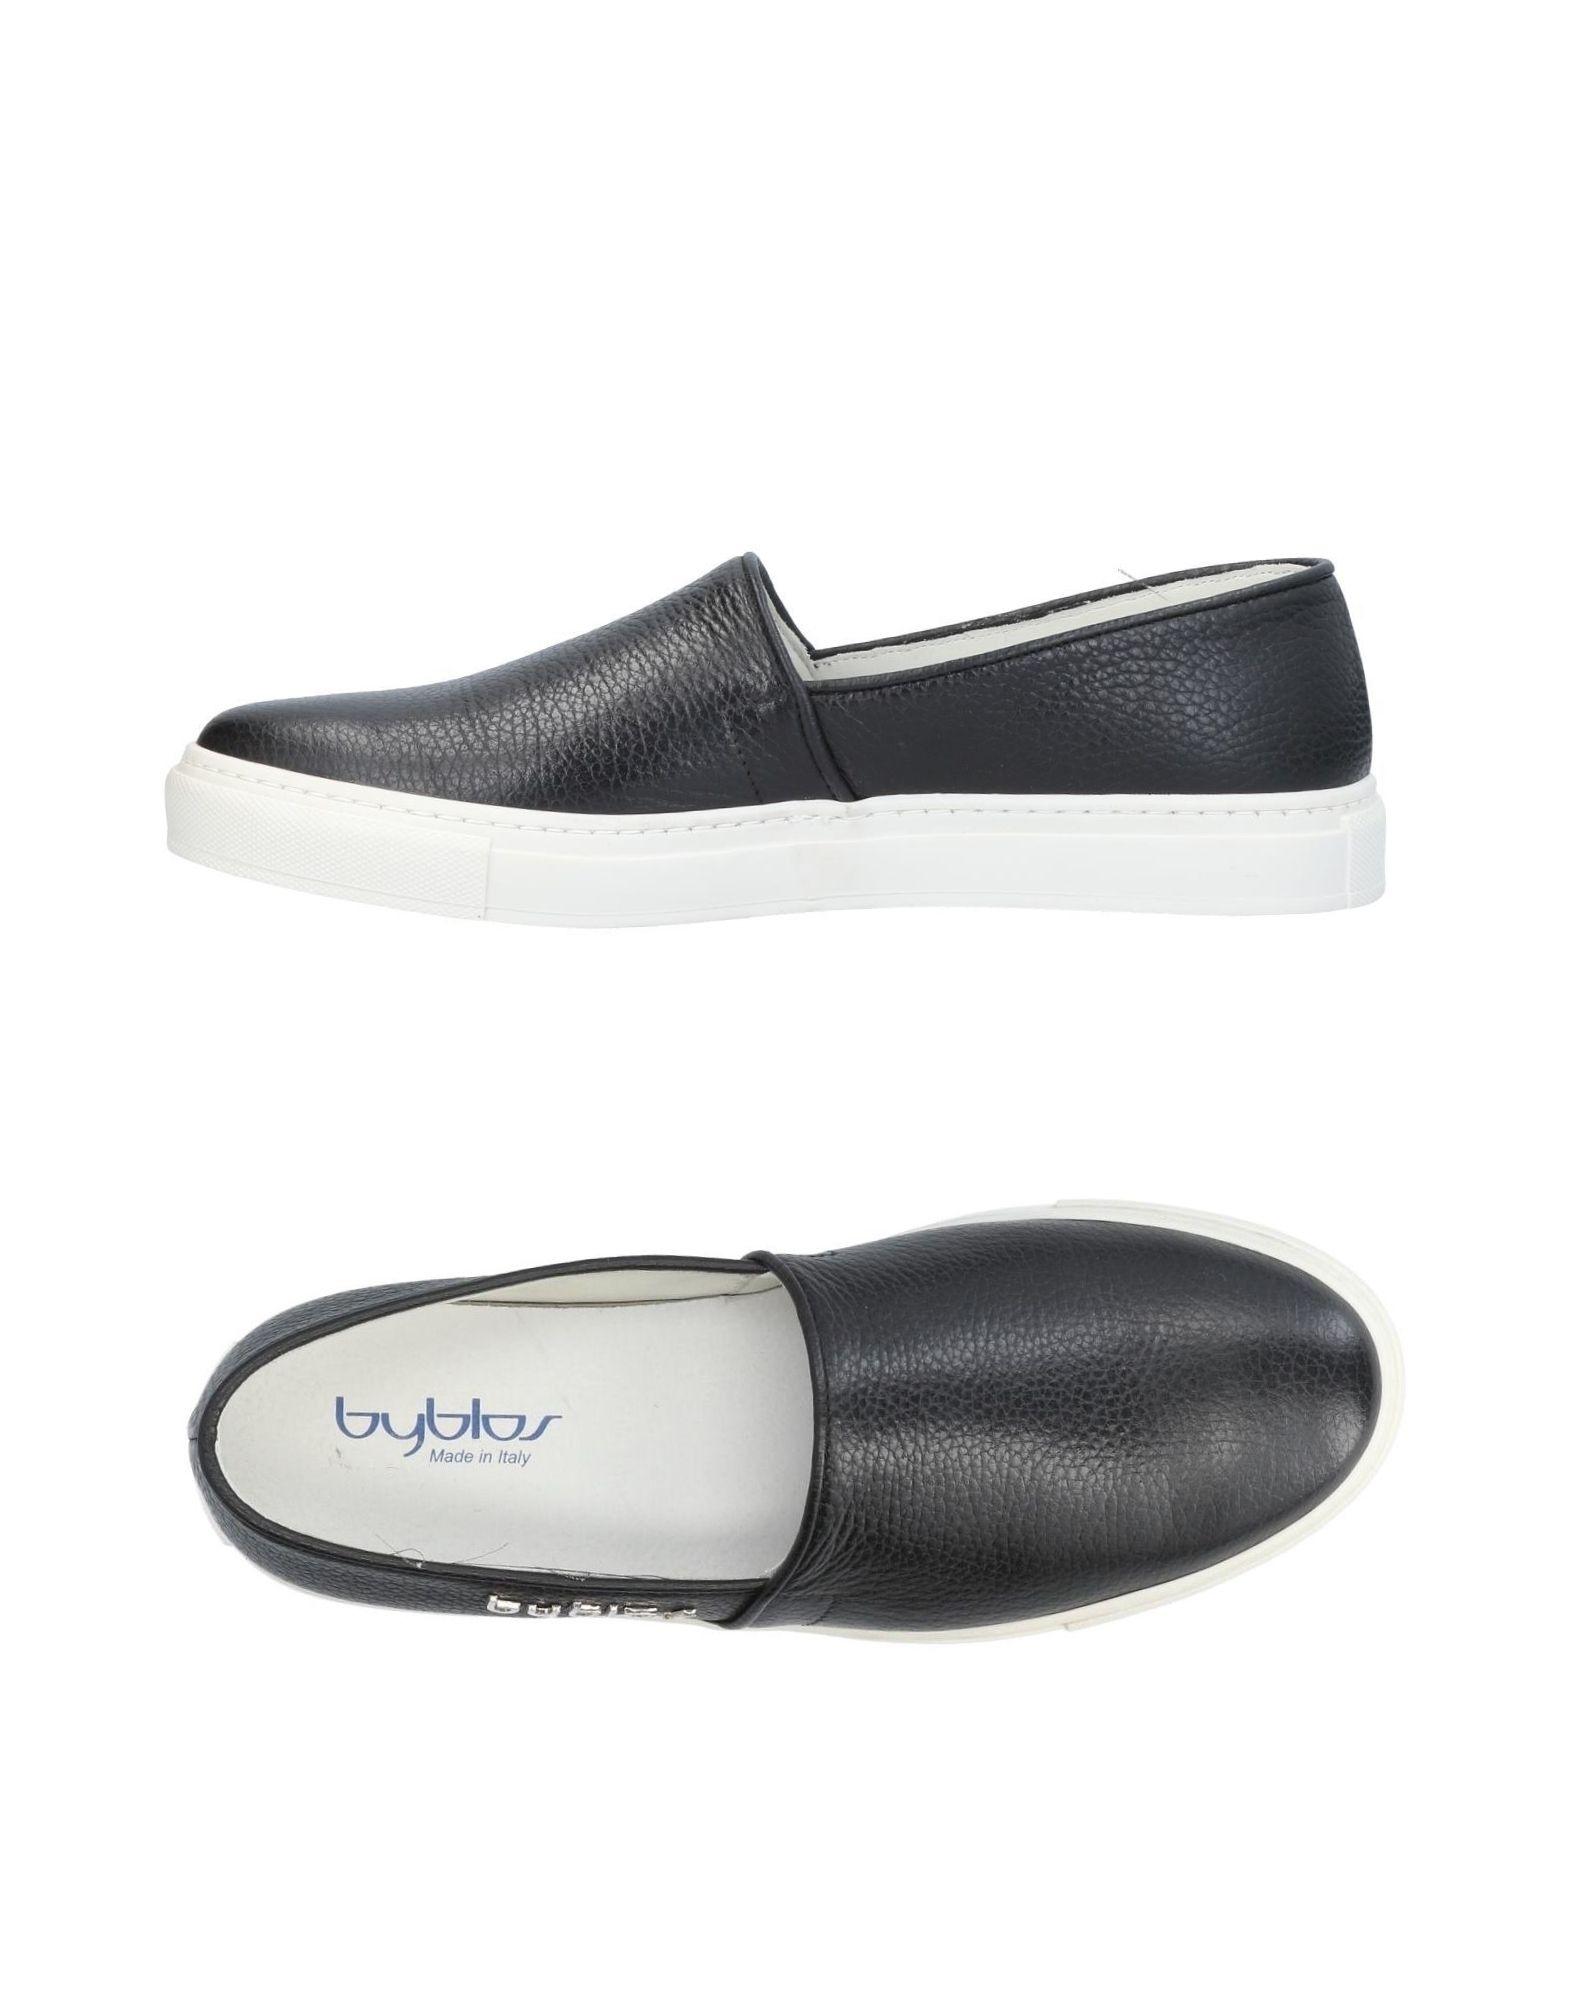 Sneakers Byblos Homme - Sneakers Byblos sur